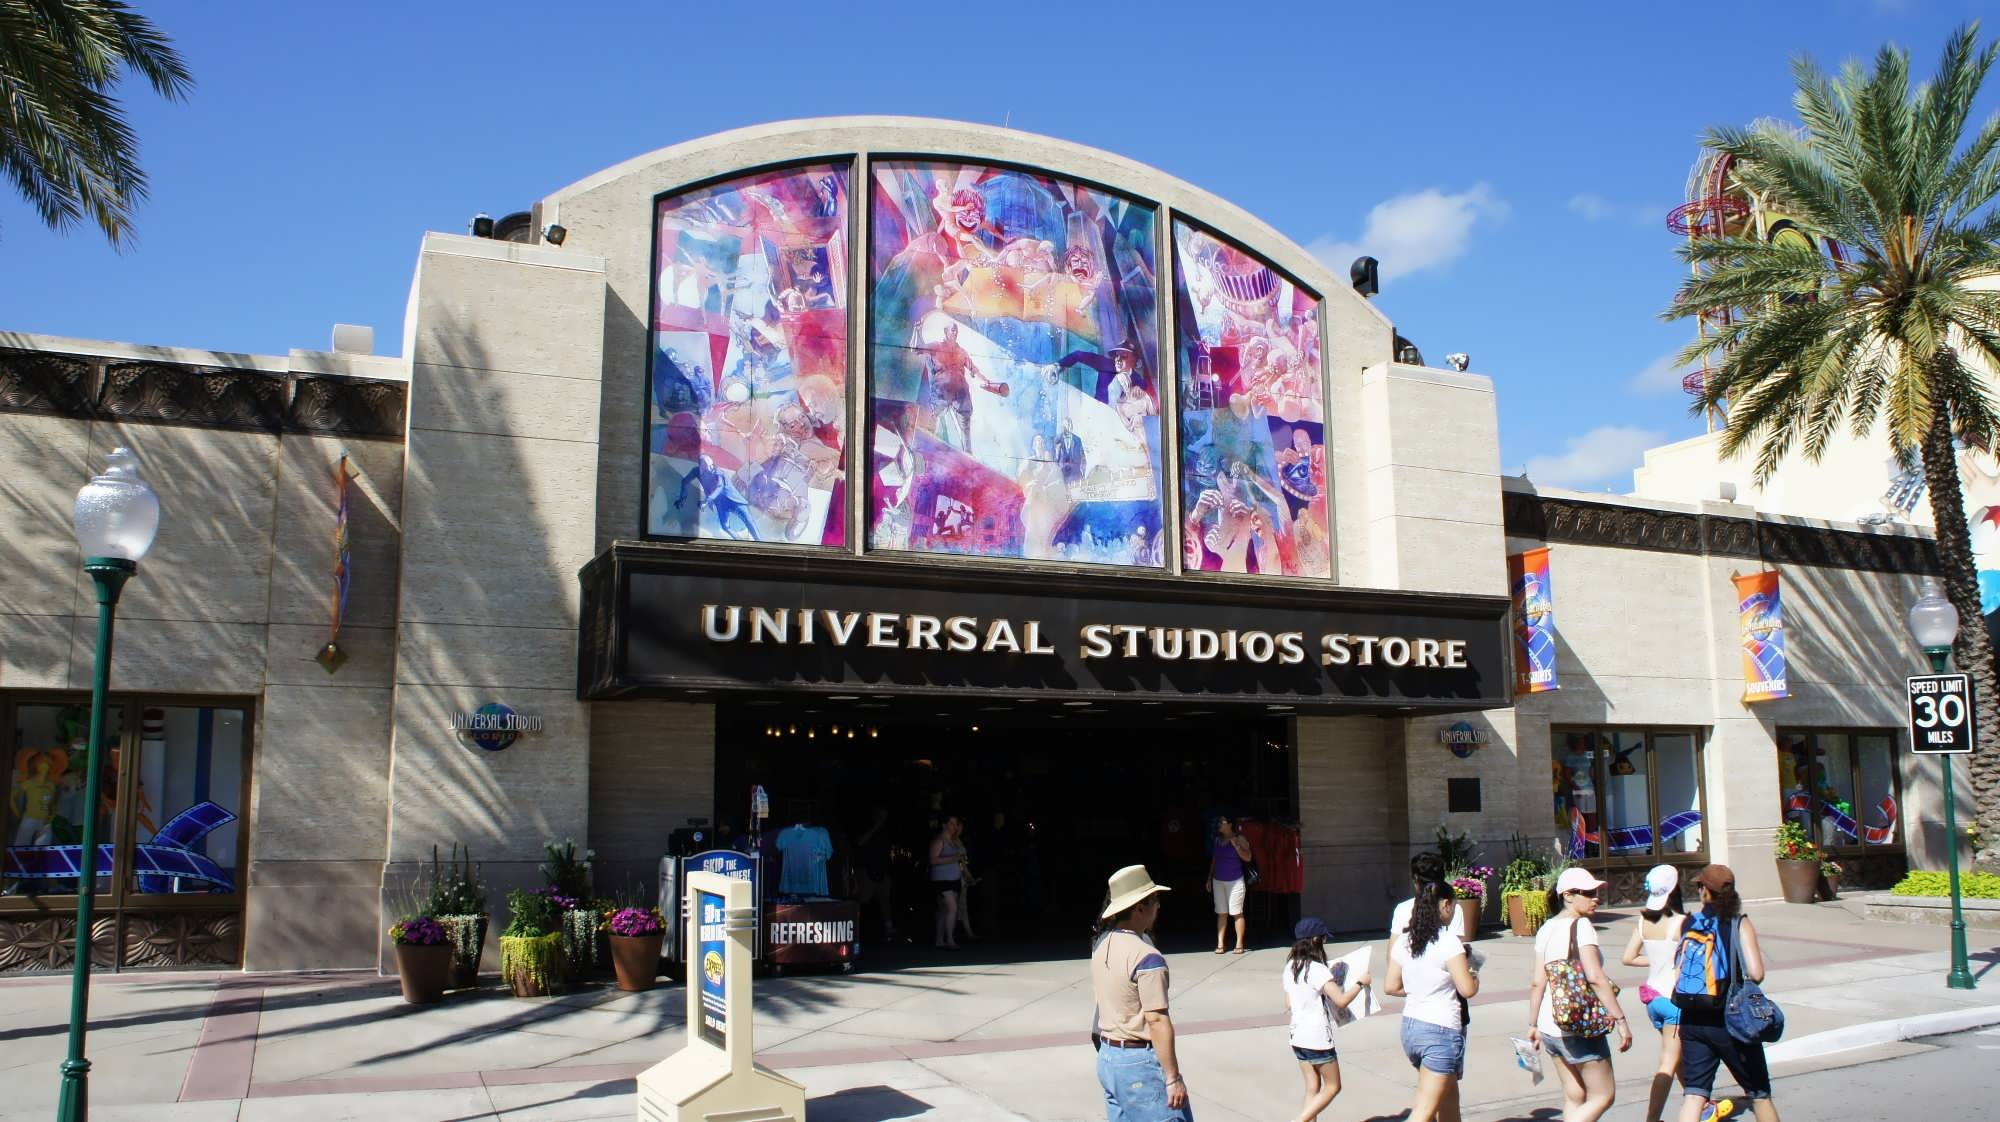 Universal Studios Store – Universal Studios Florida.